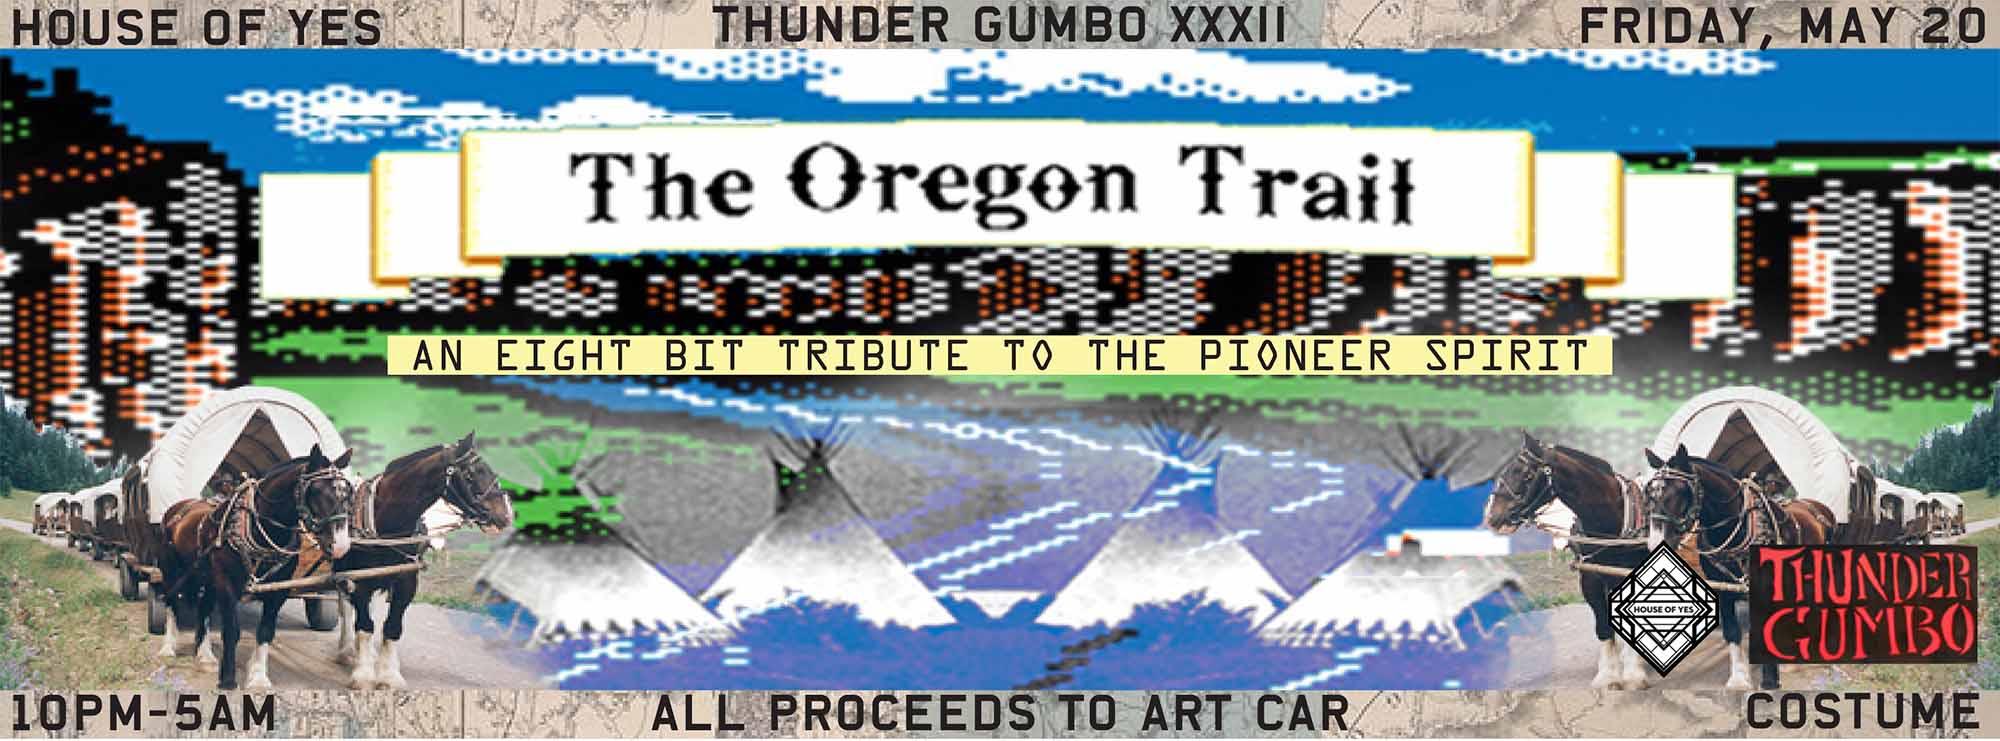 Thunder Gumbo XXII: The Oregon Trail